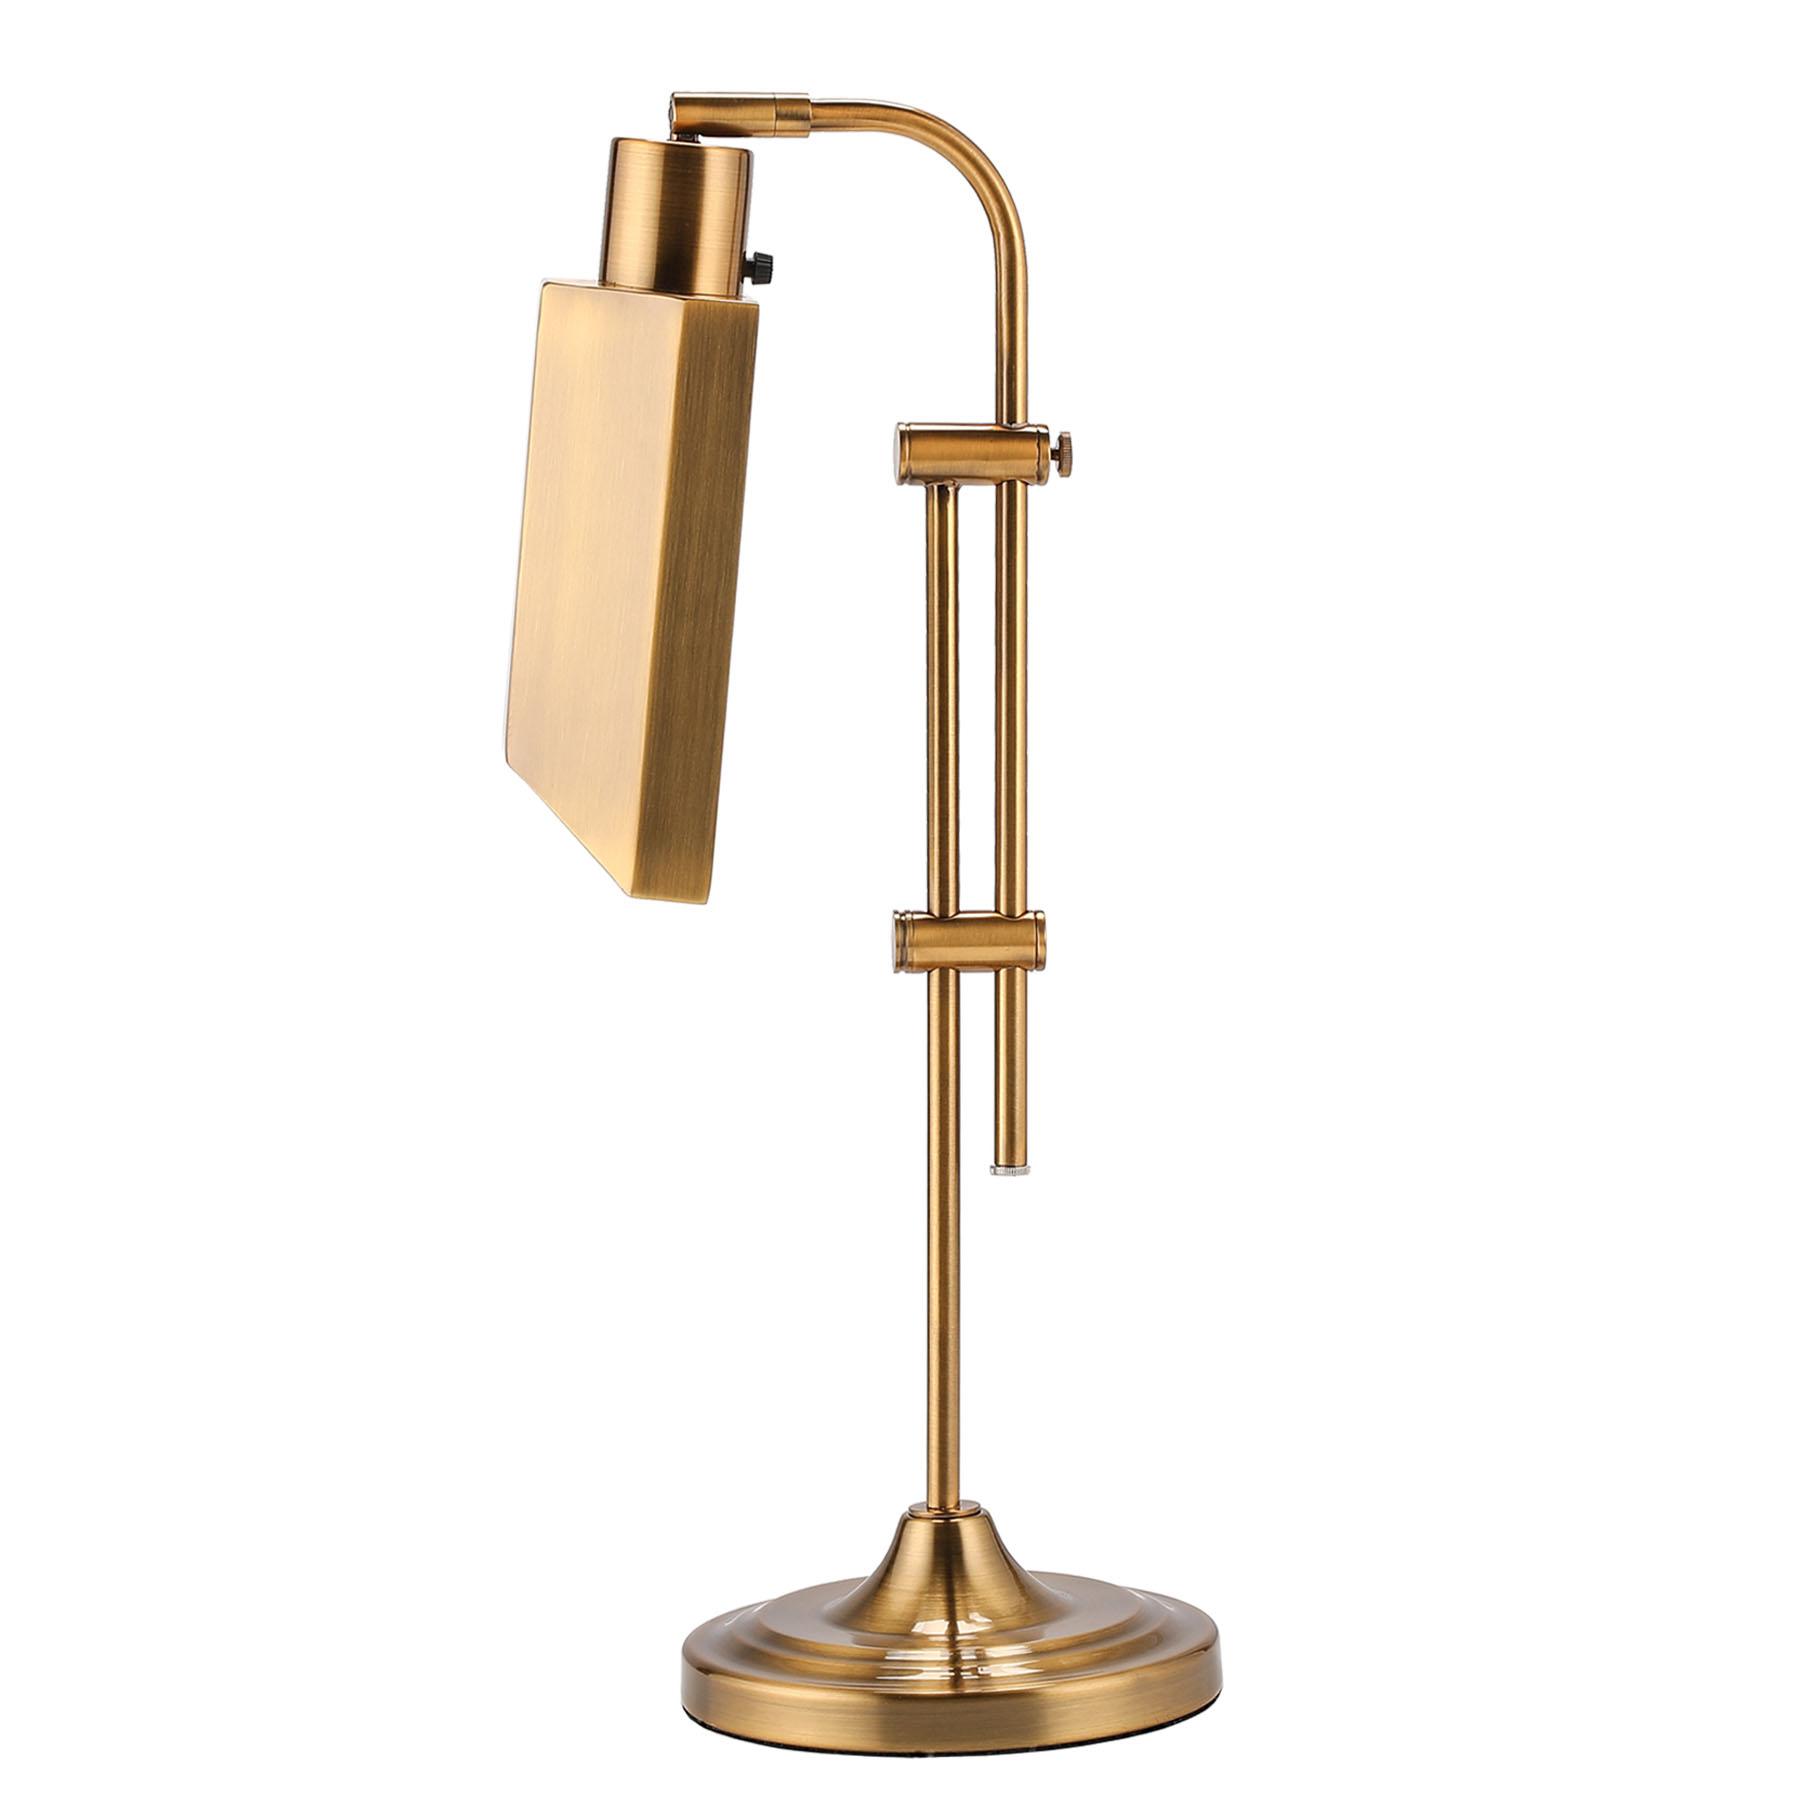 Adjustable Pharmacy Table Lamp Led Table Lamp Adjustable Height